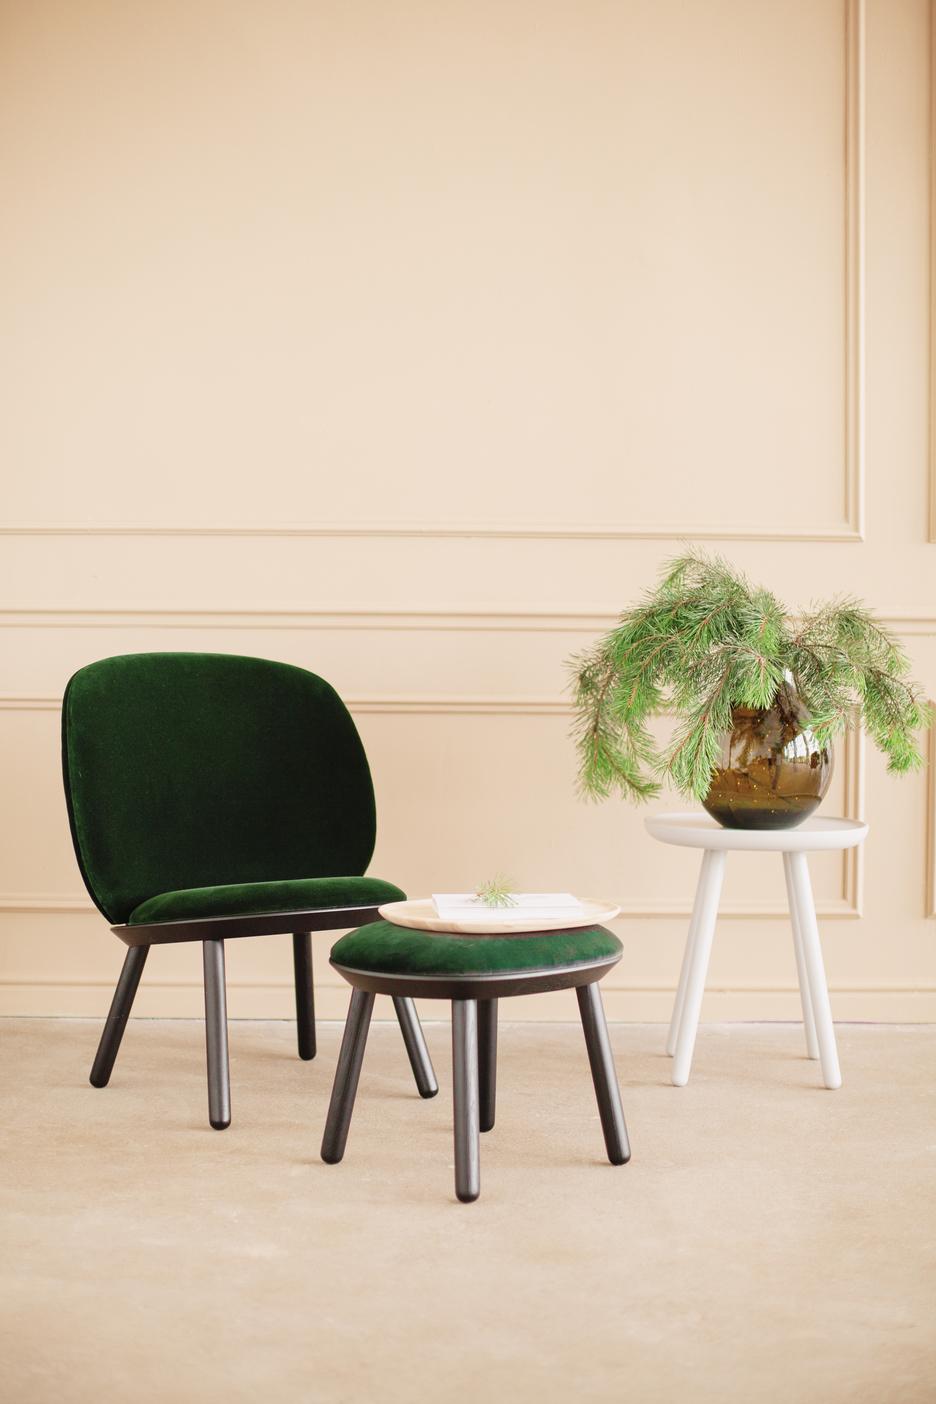 Lounge-Sessel Lesesessel Design günstig kaufen